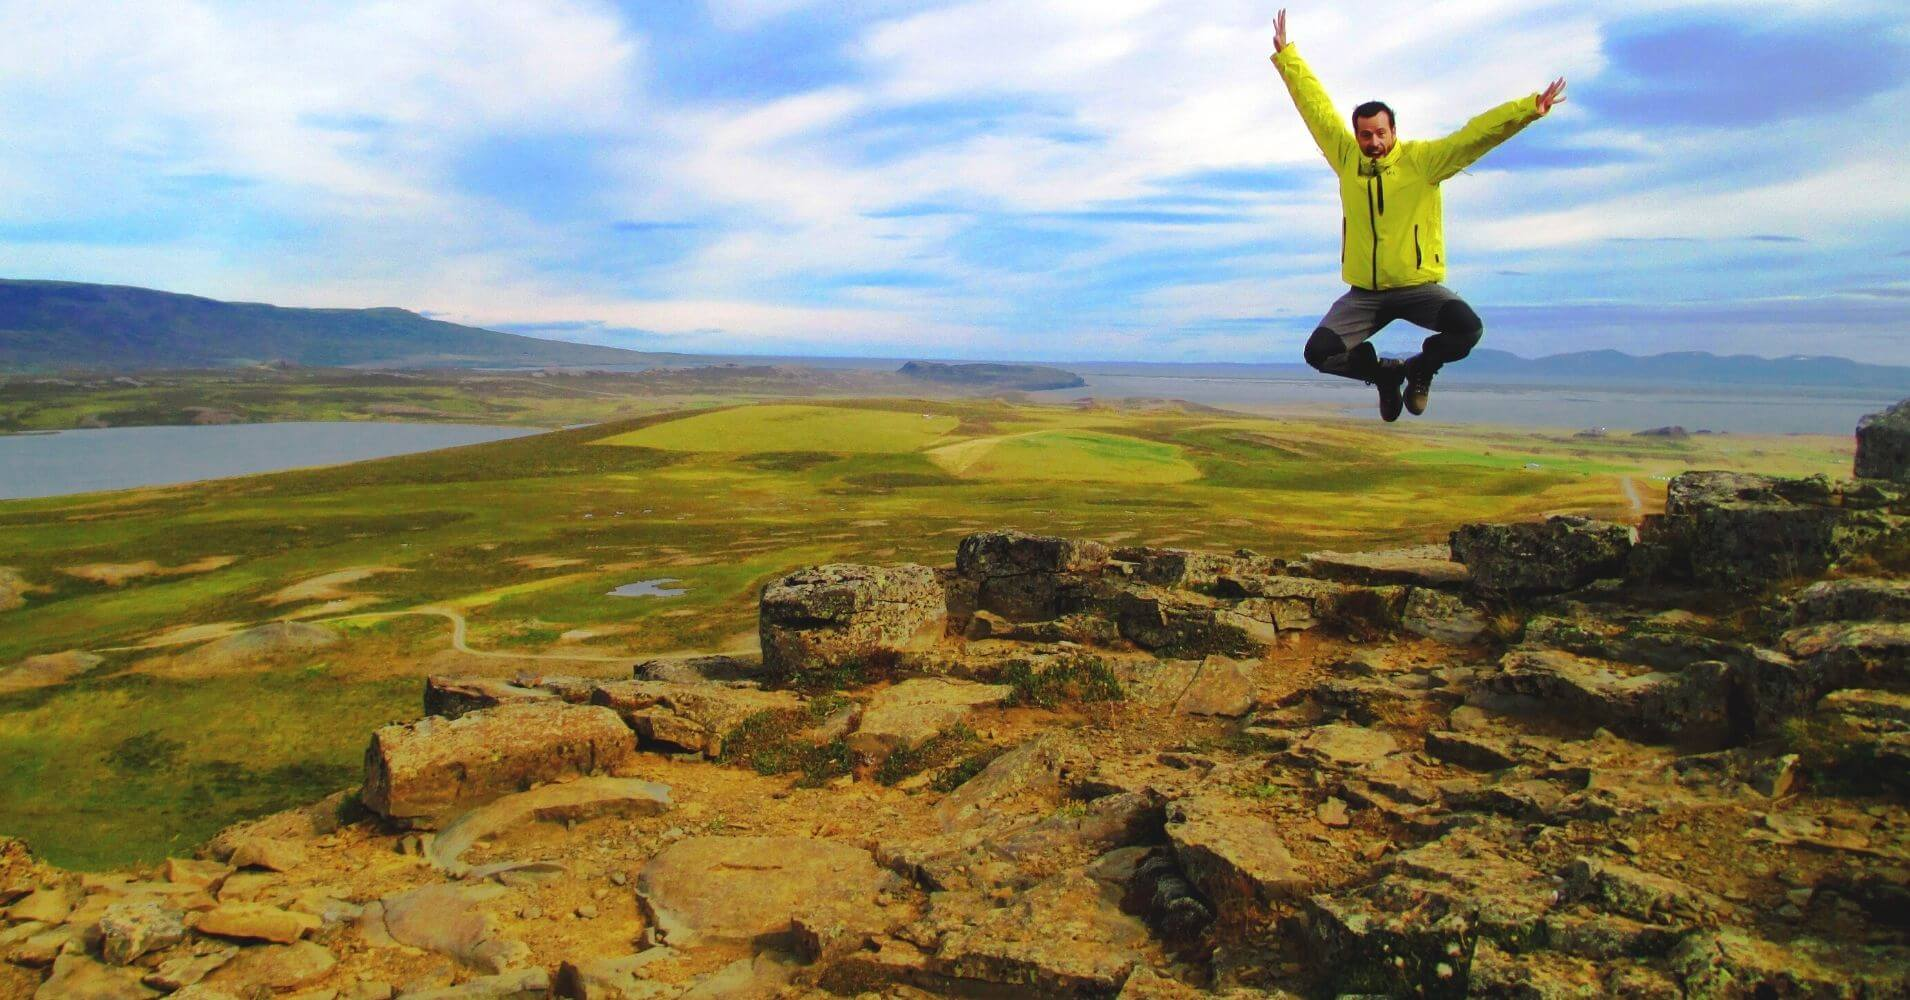 En la Península de Vatnsnes. Hvammstangi. Norðurland Vestra. Islandia.